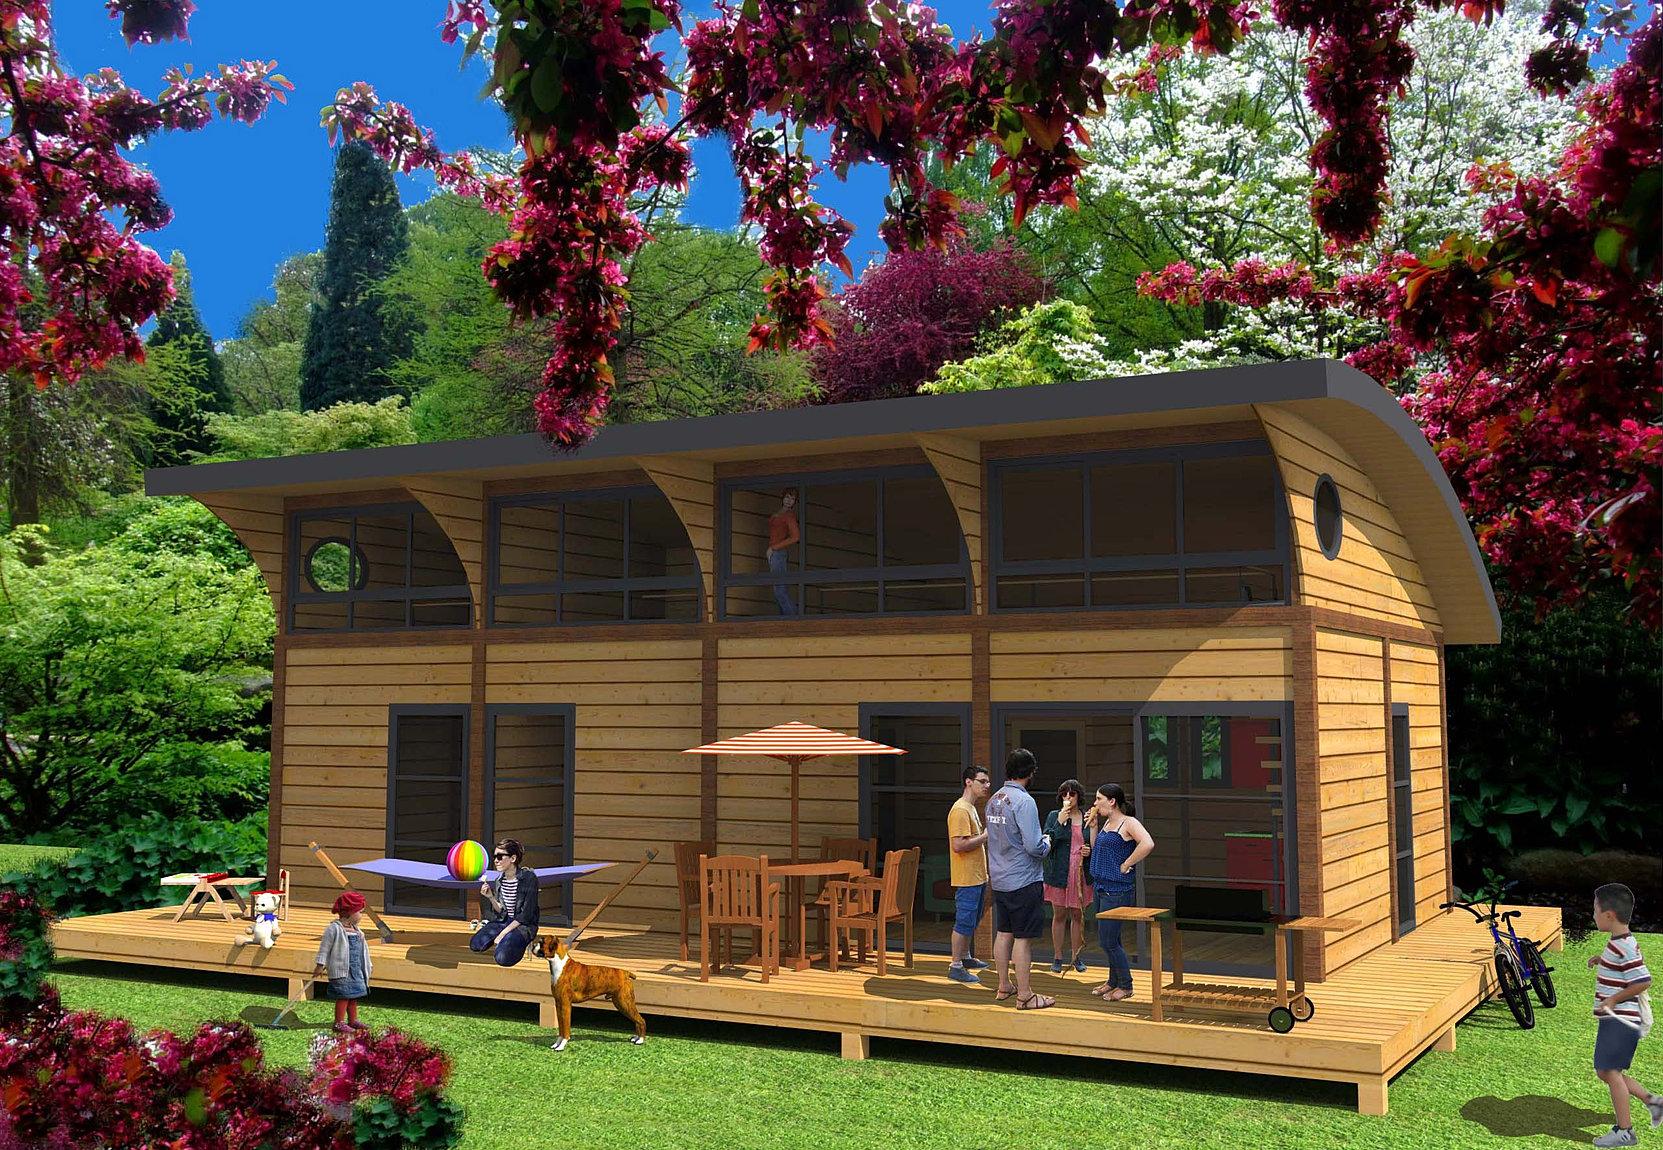 Free habitat modulaire with maison bois gard for Habitat modulaire bois